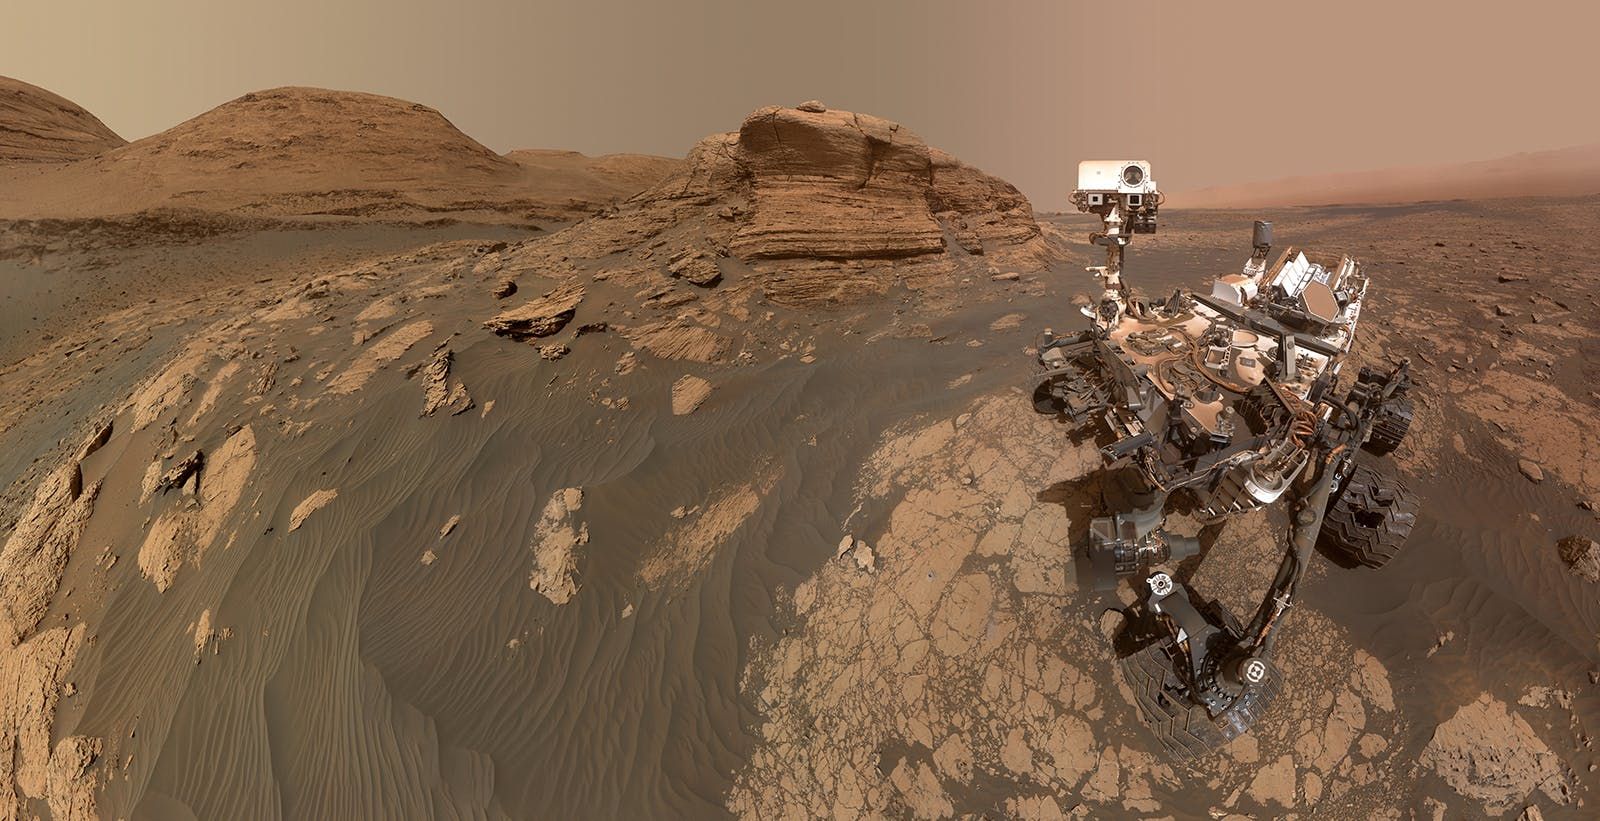 Arriva da Marte il selfie da 318 megapixel del rover Curiosity